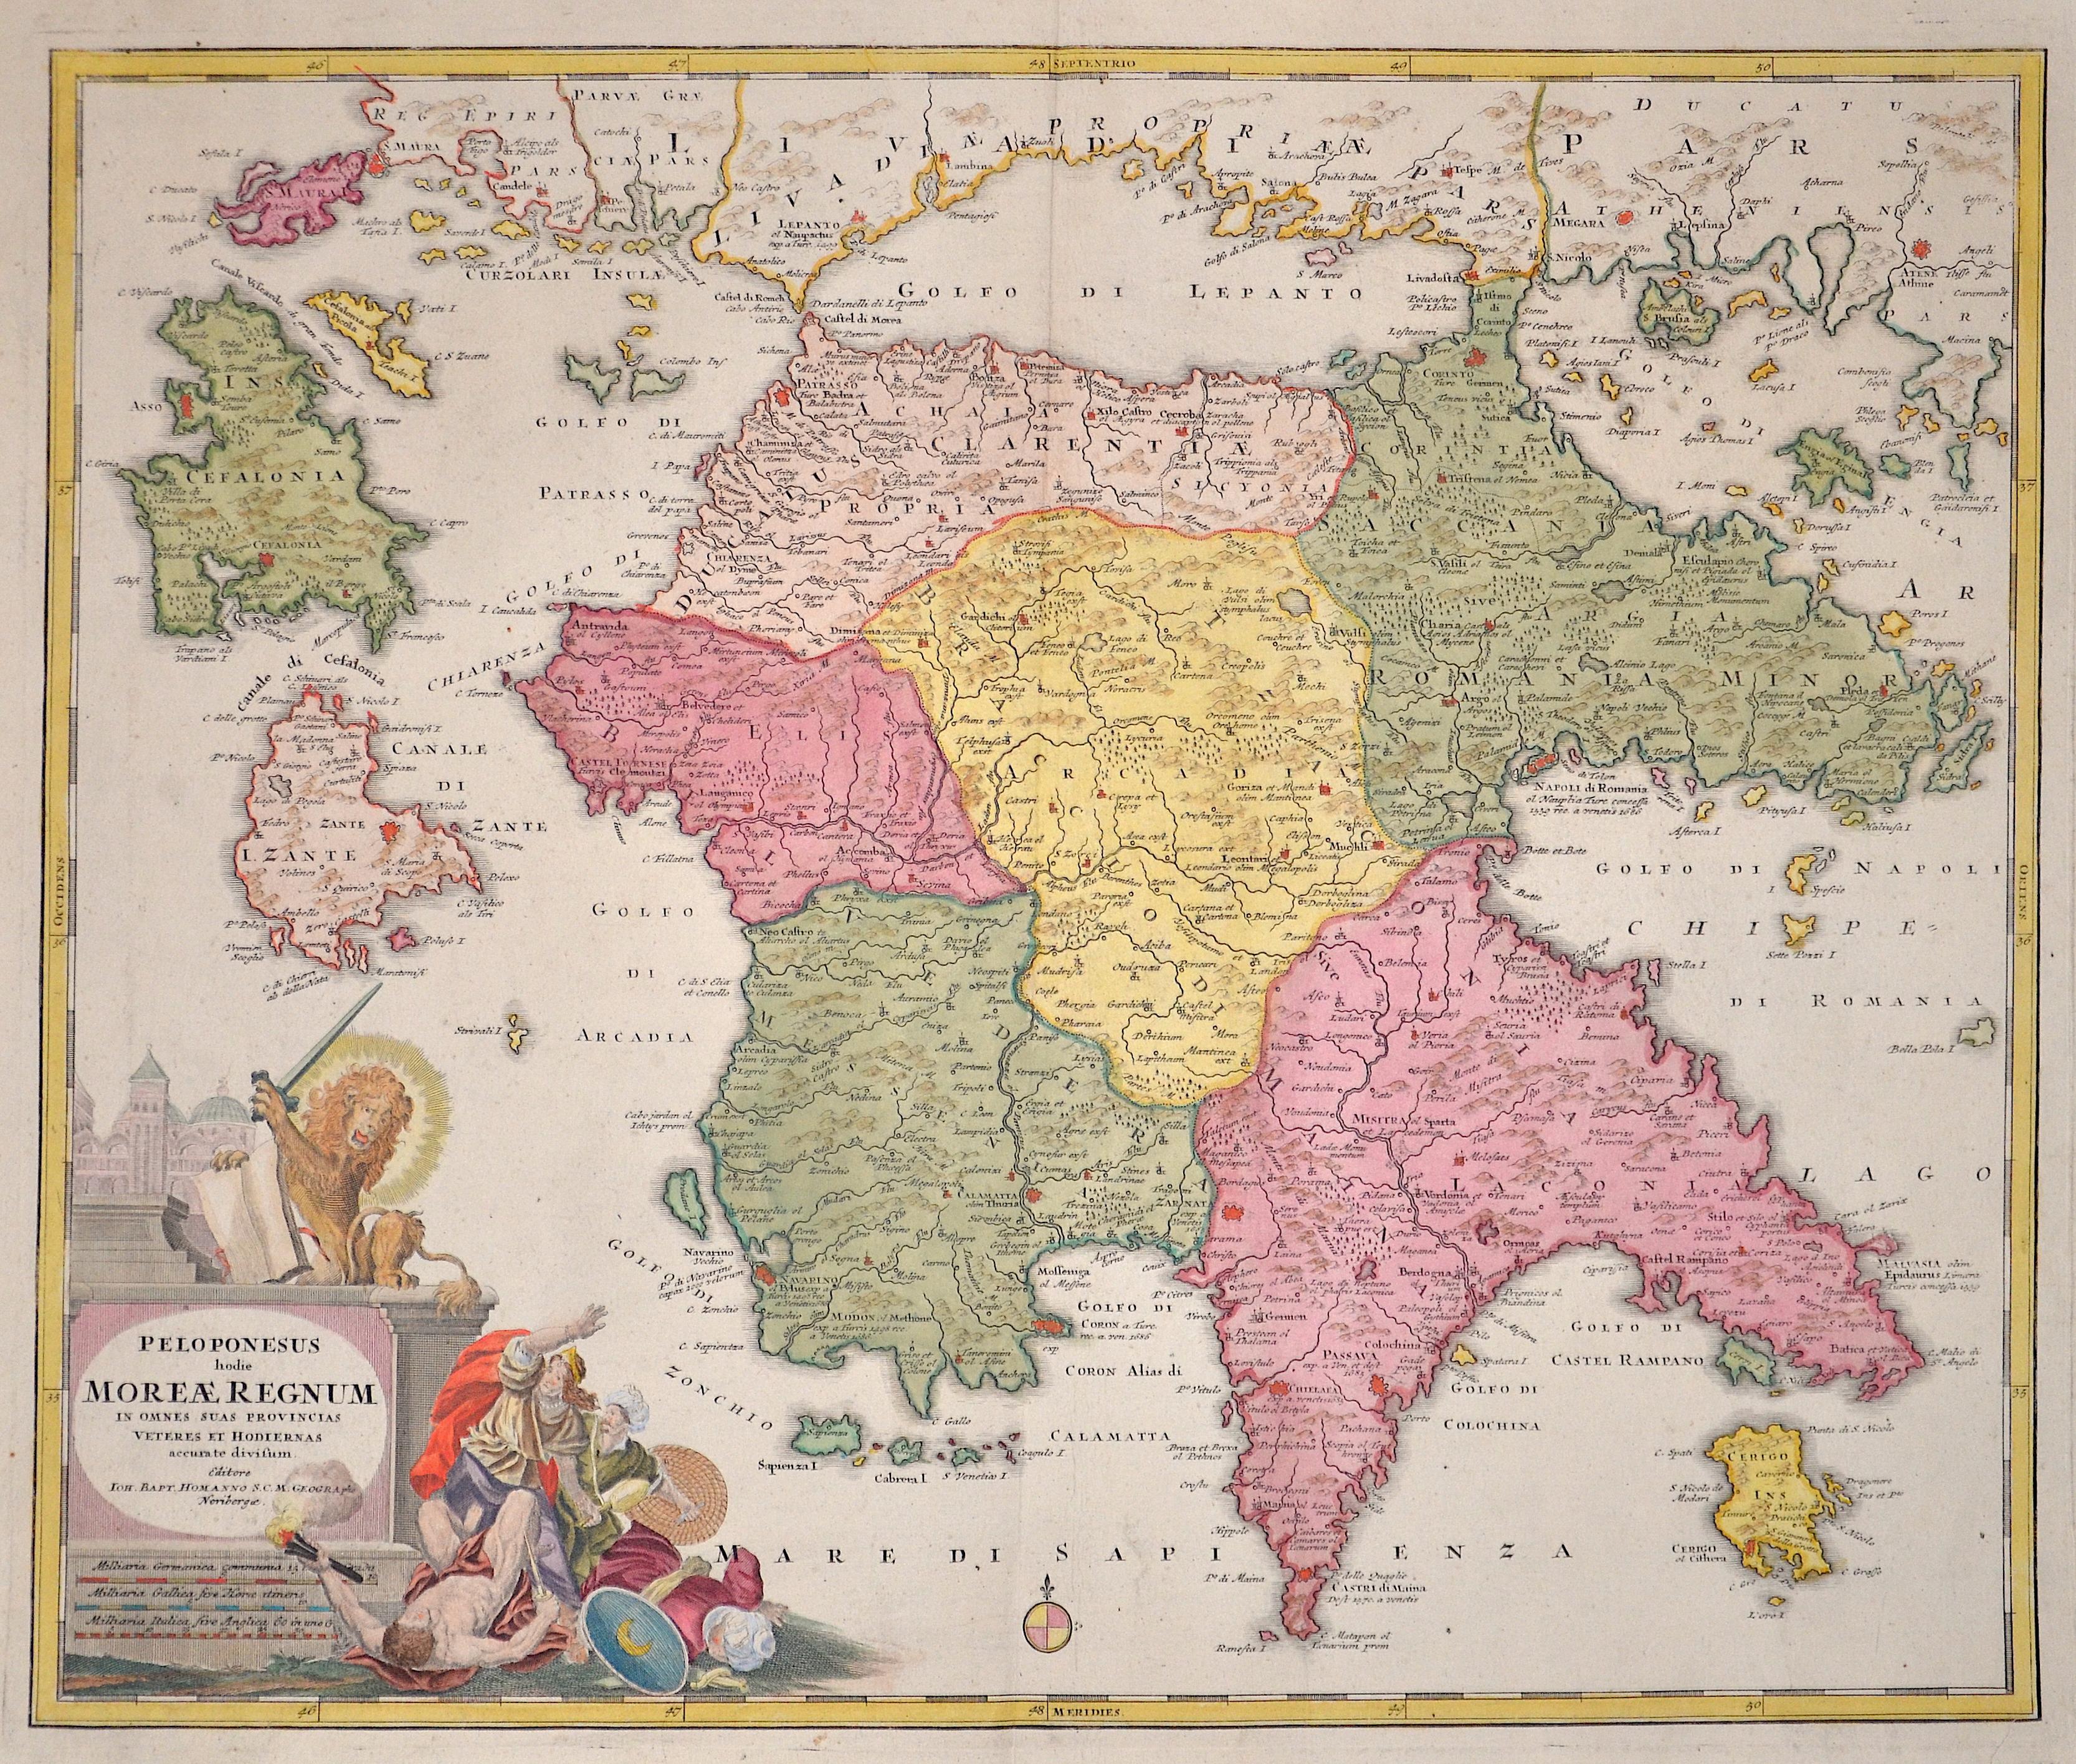 Homann  Peleponesus hodie Moreae regnum in omnes suas Provincias verters et hodiernas..